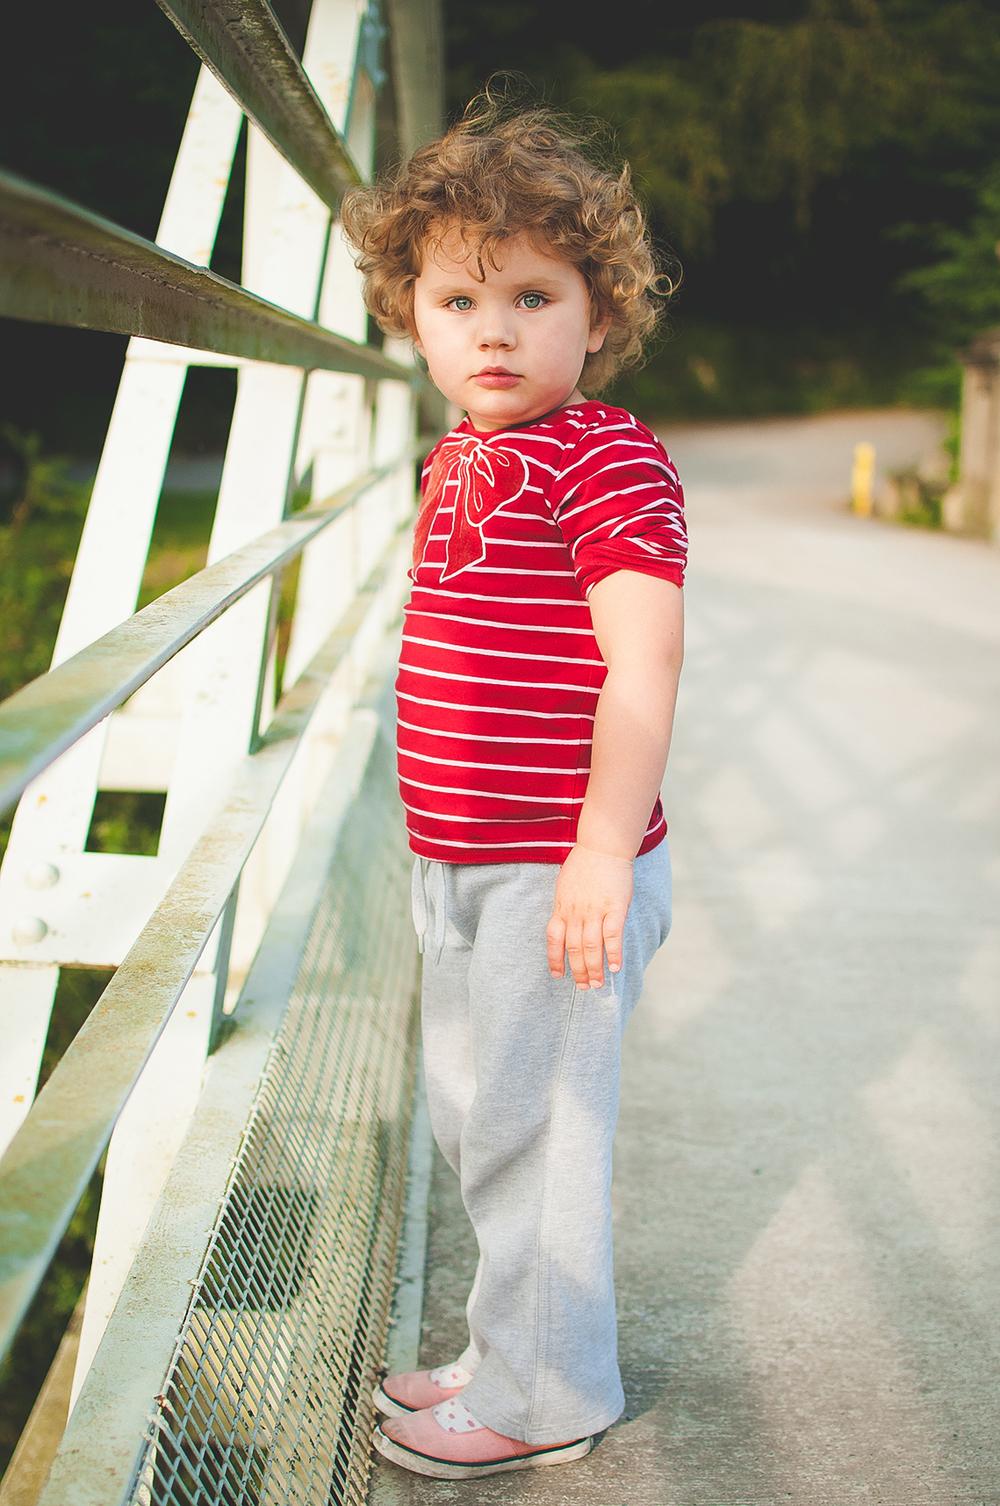 photographer cahir tipperary clonmel cashel portrait 4.jpg